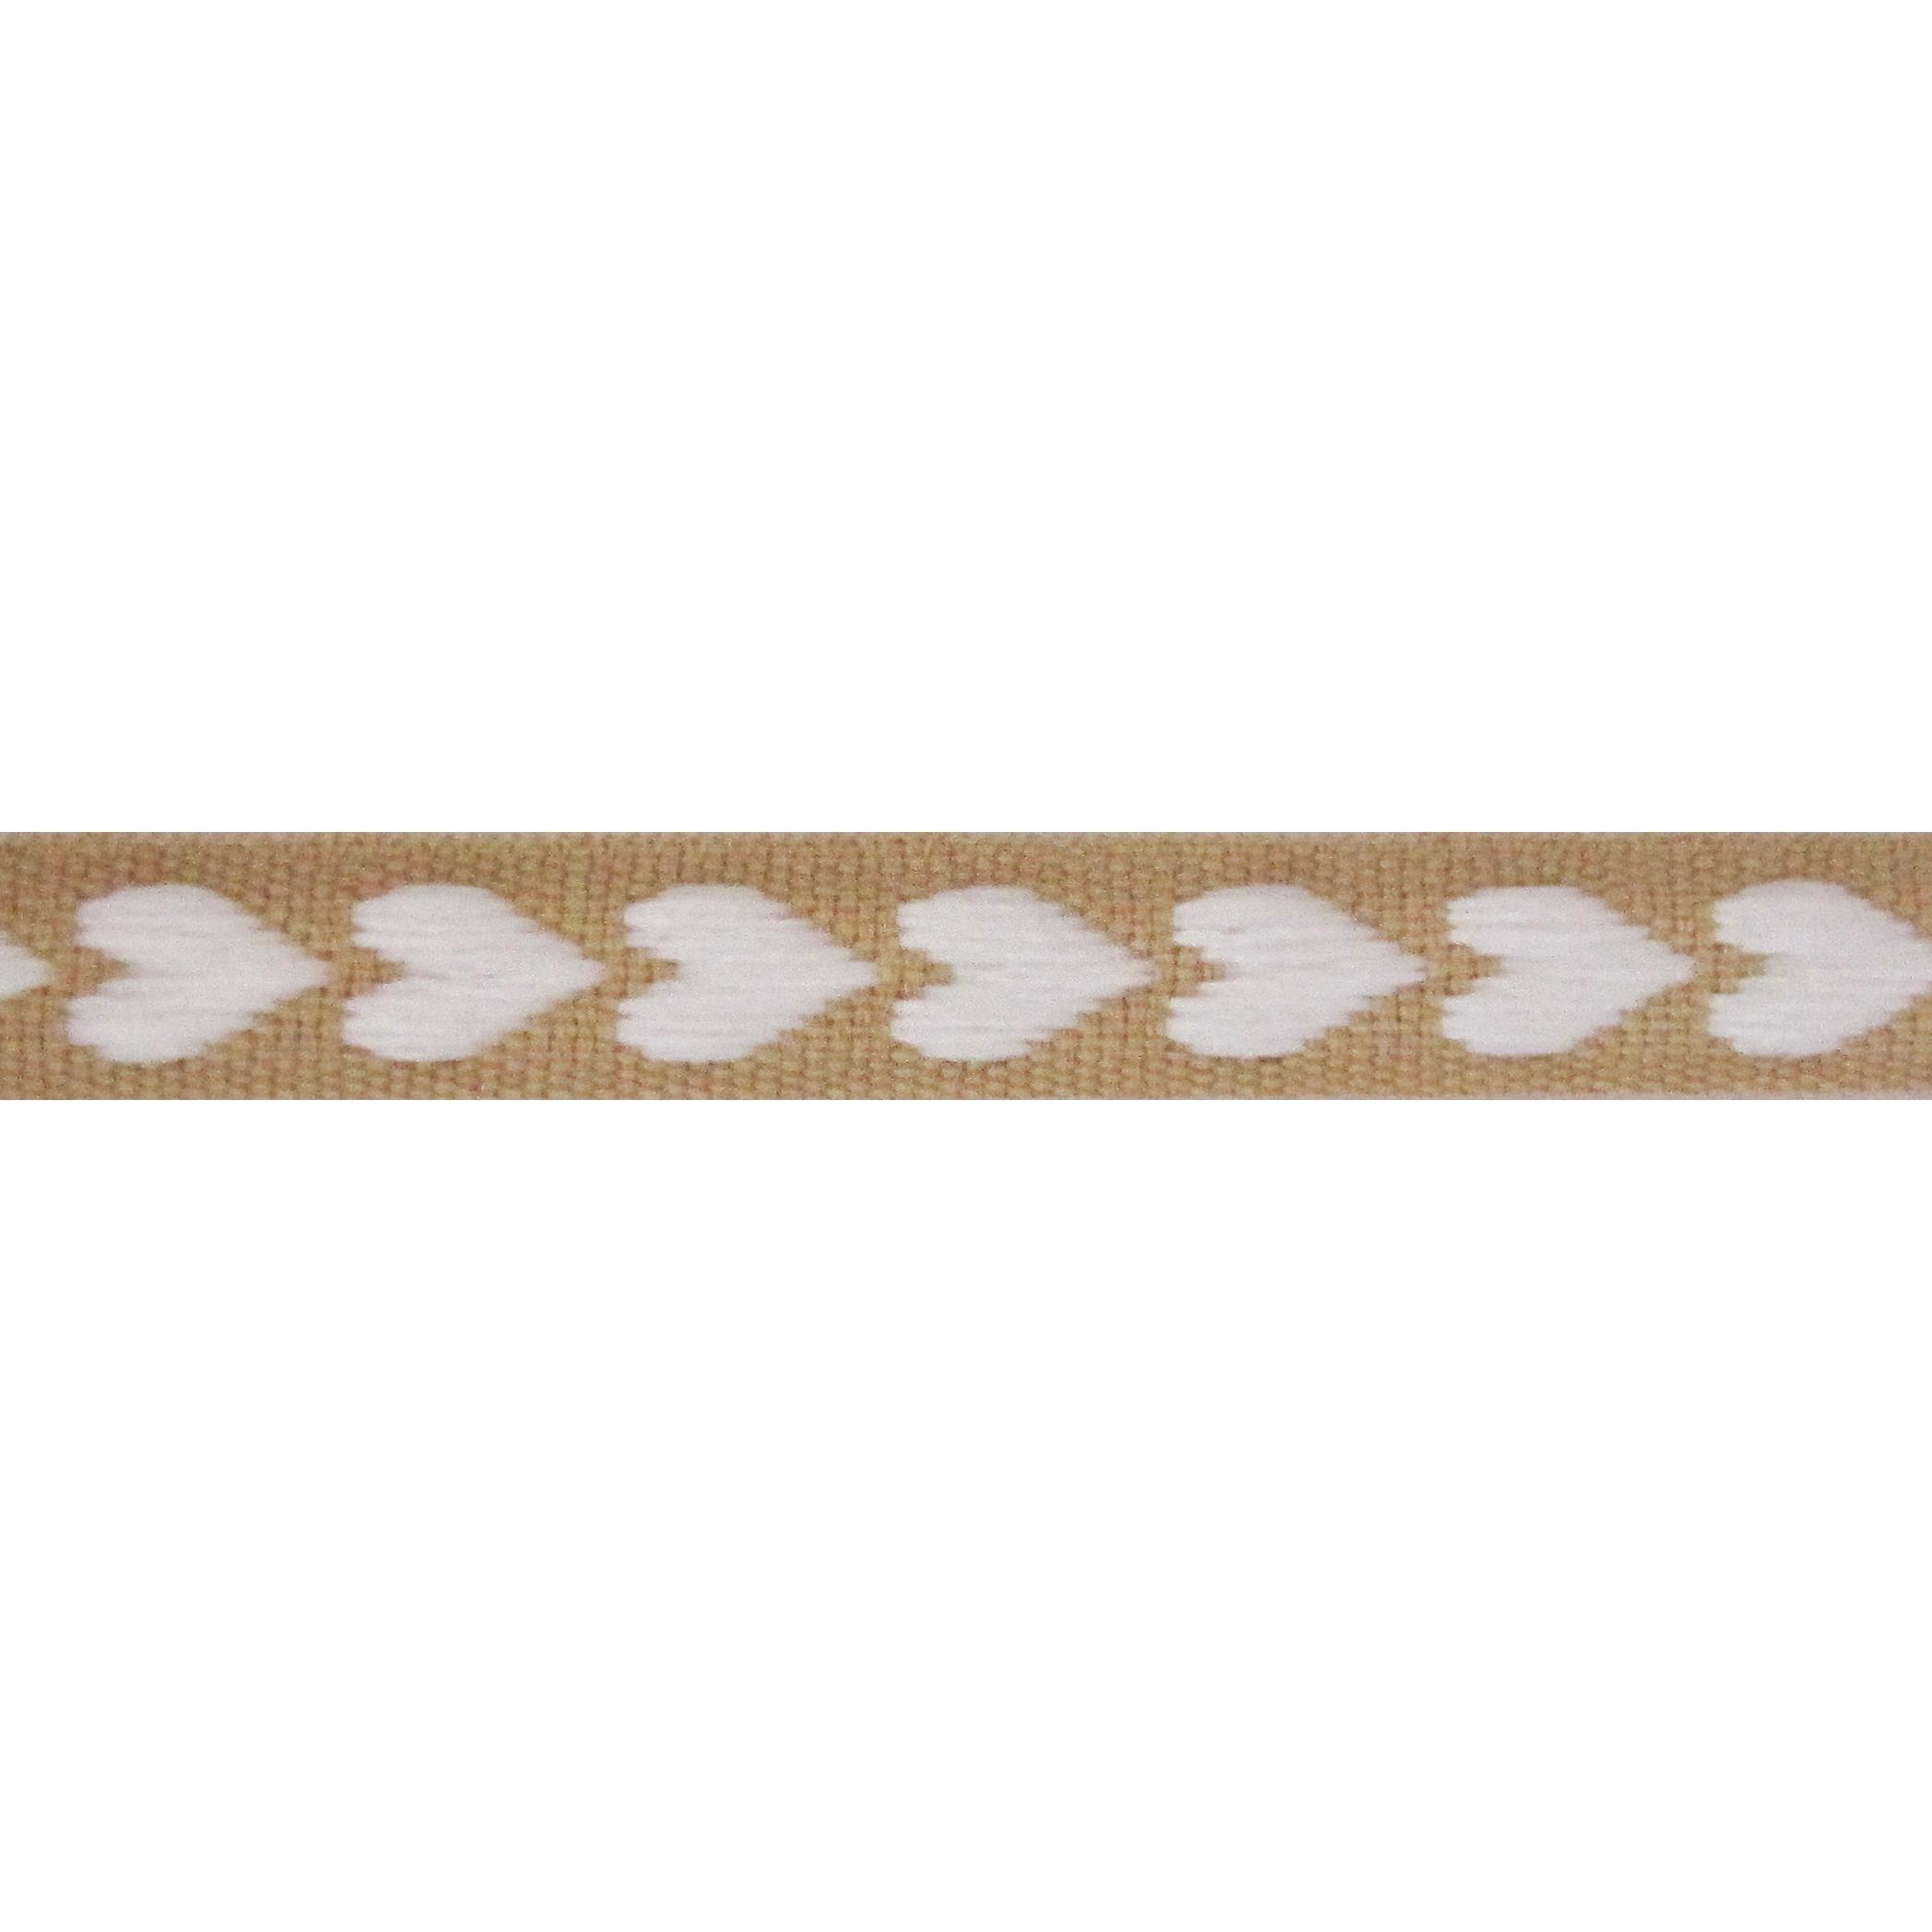 Lint harten 10mm - Weefband Beige Wit